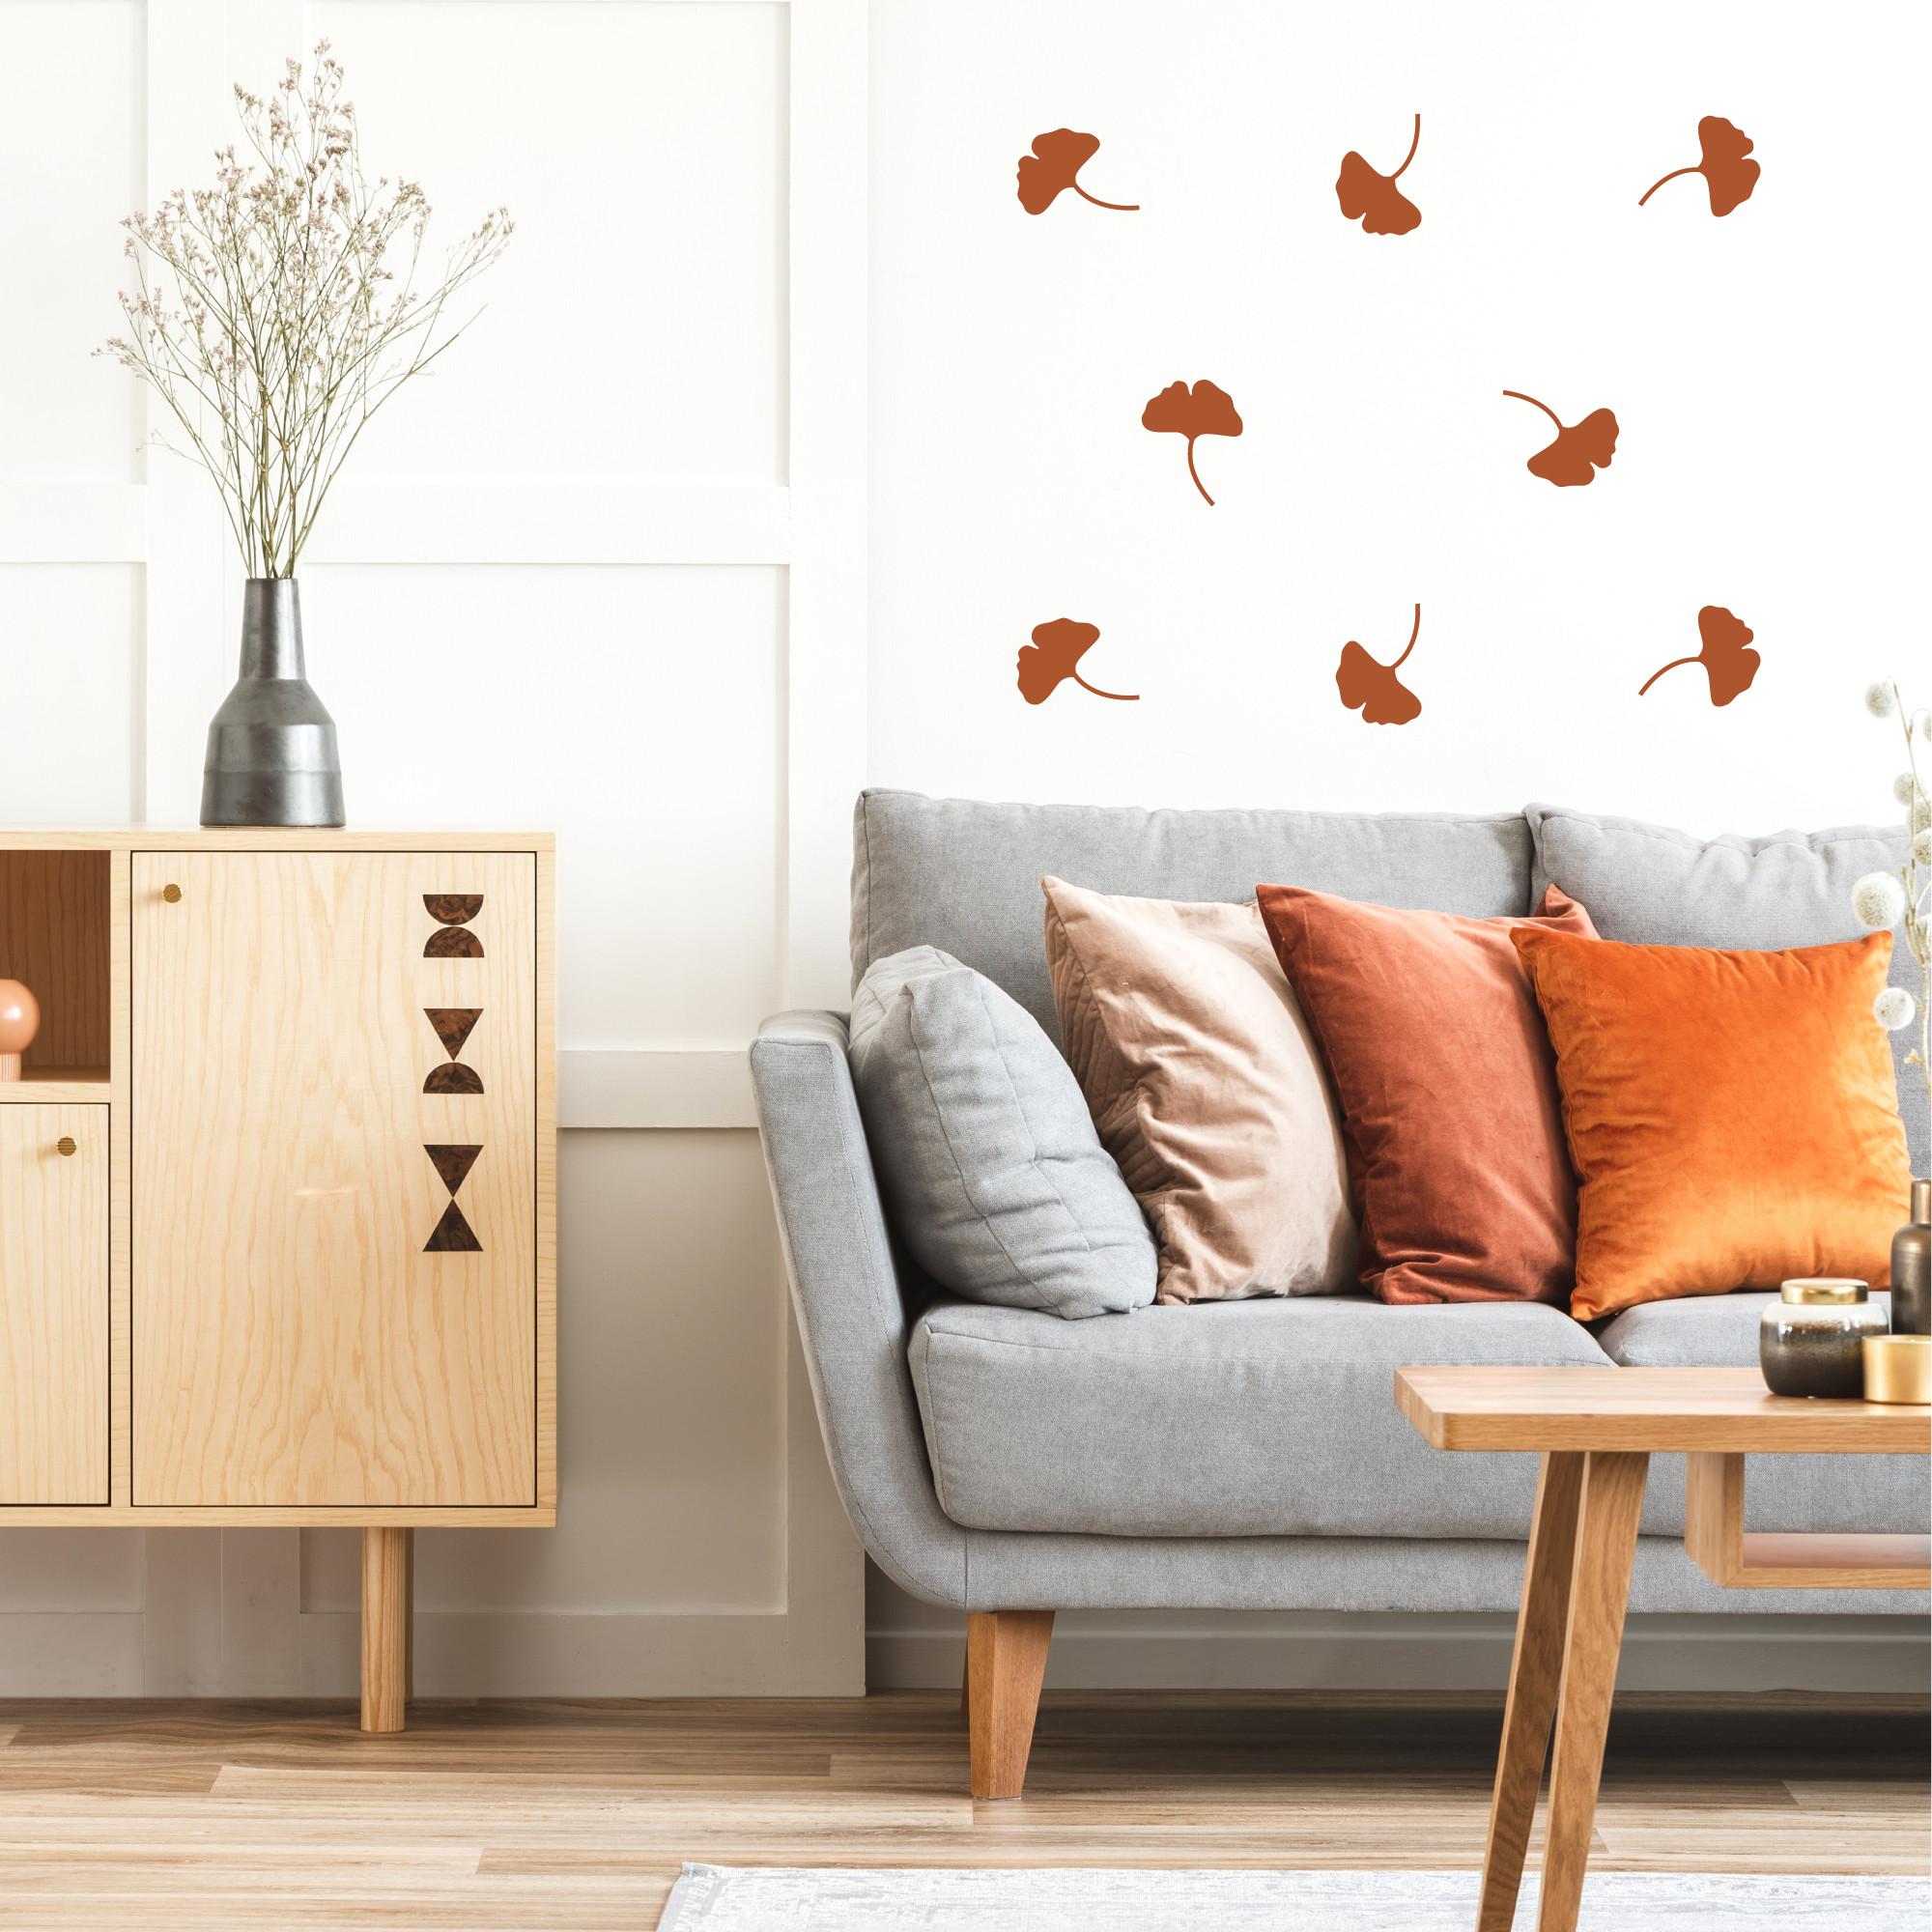 Déco mur stickers muraux feuilles de gingko cuivre